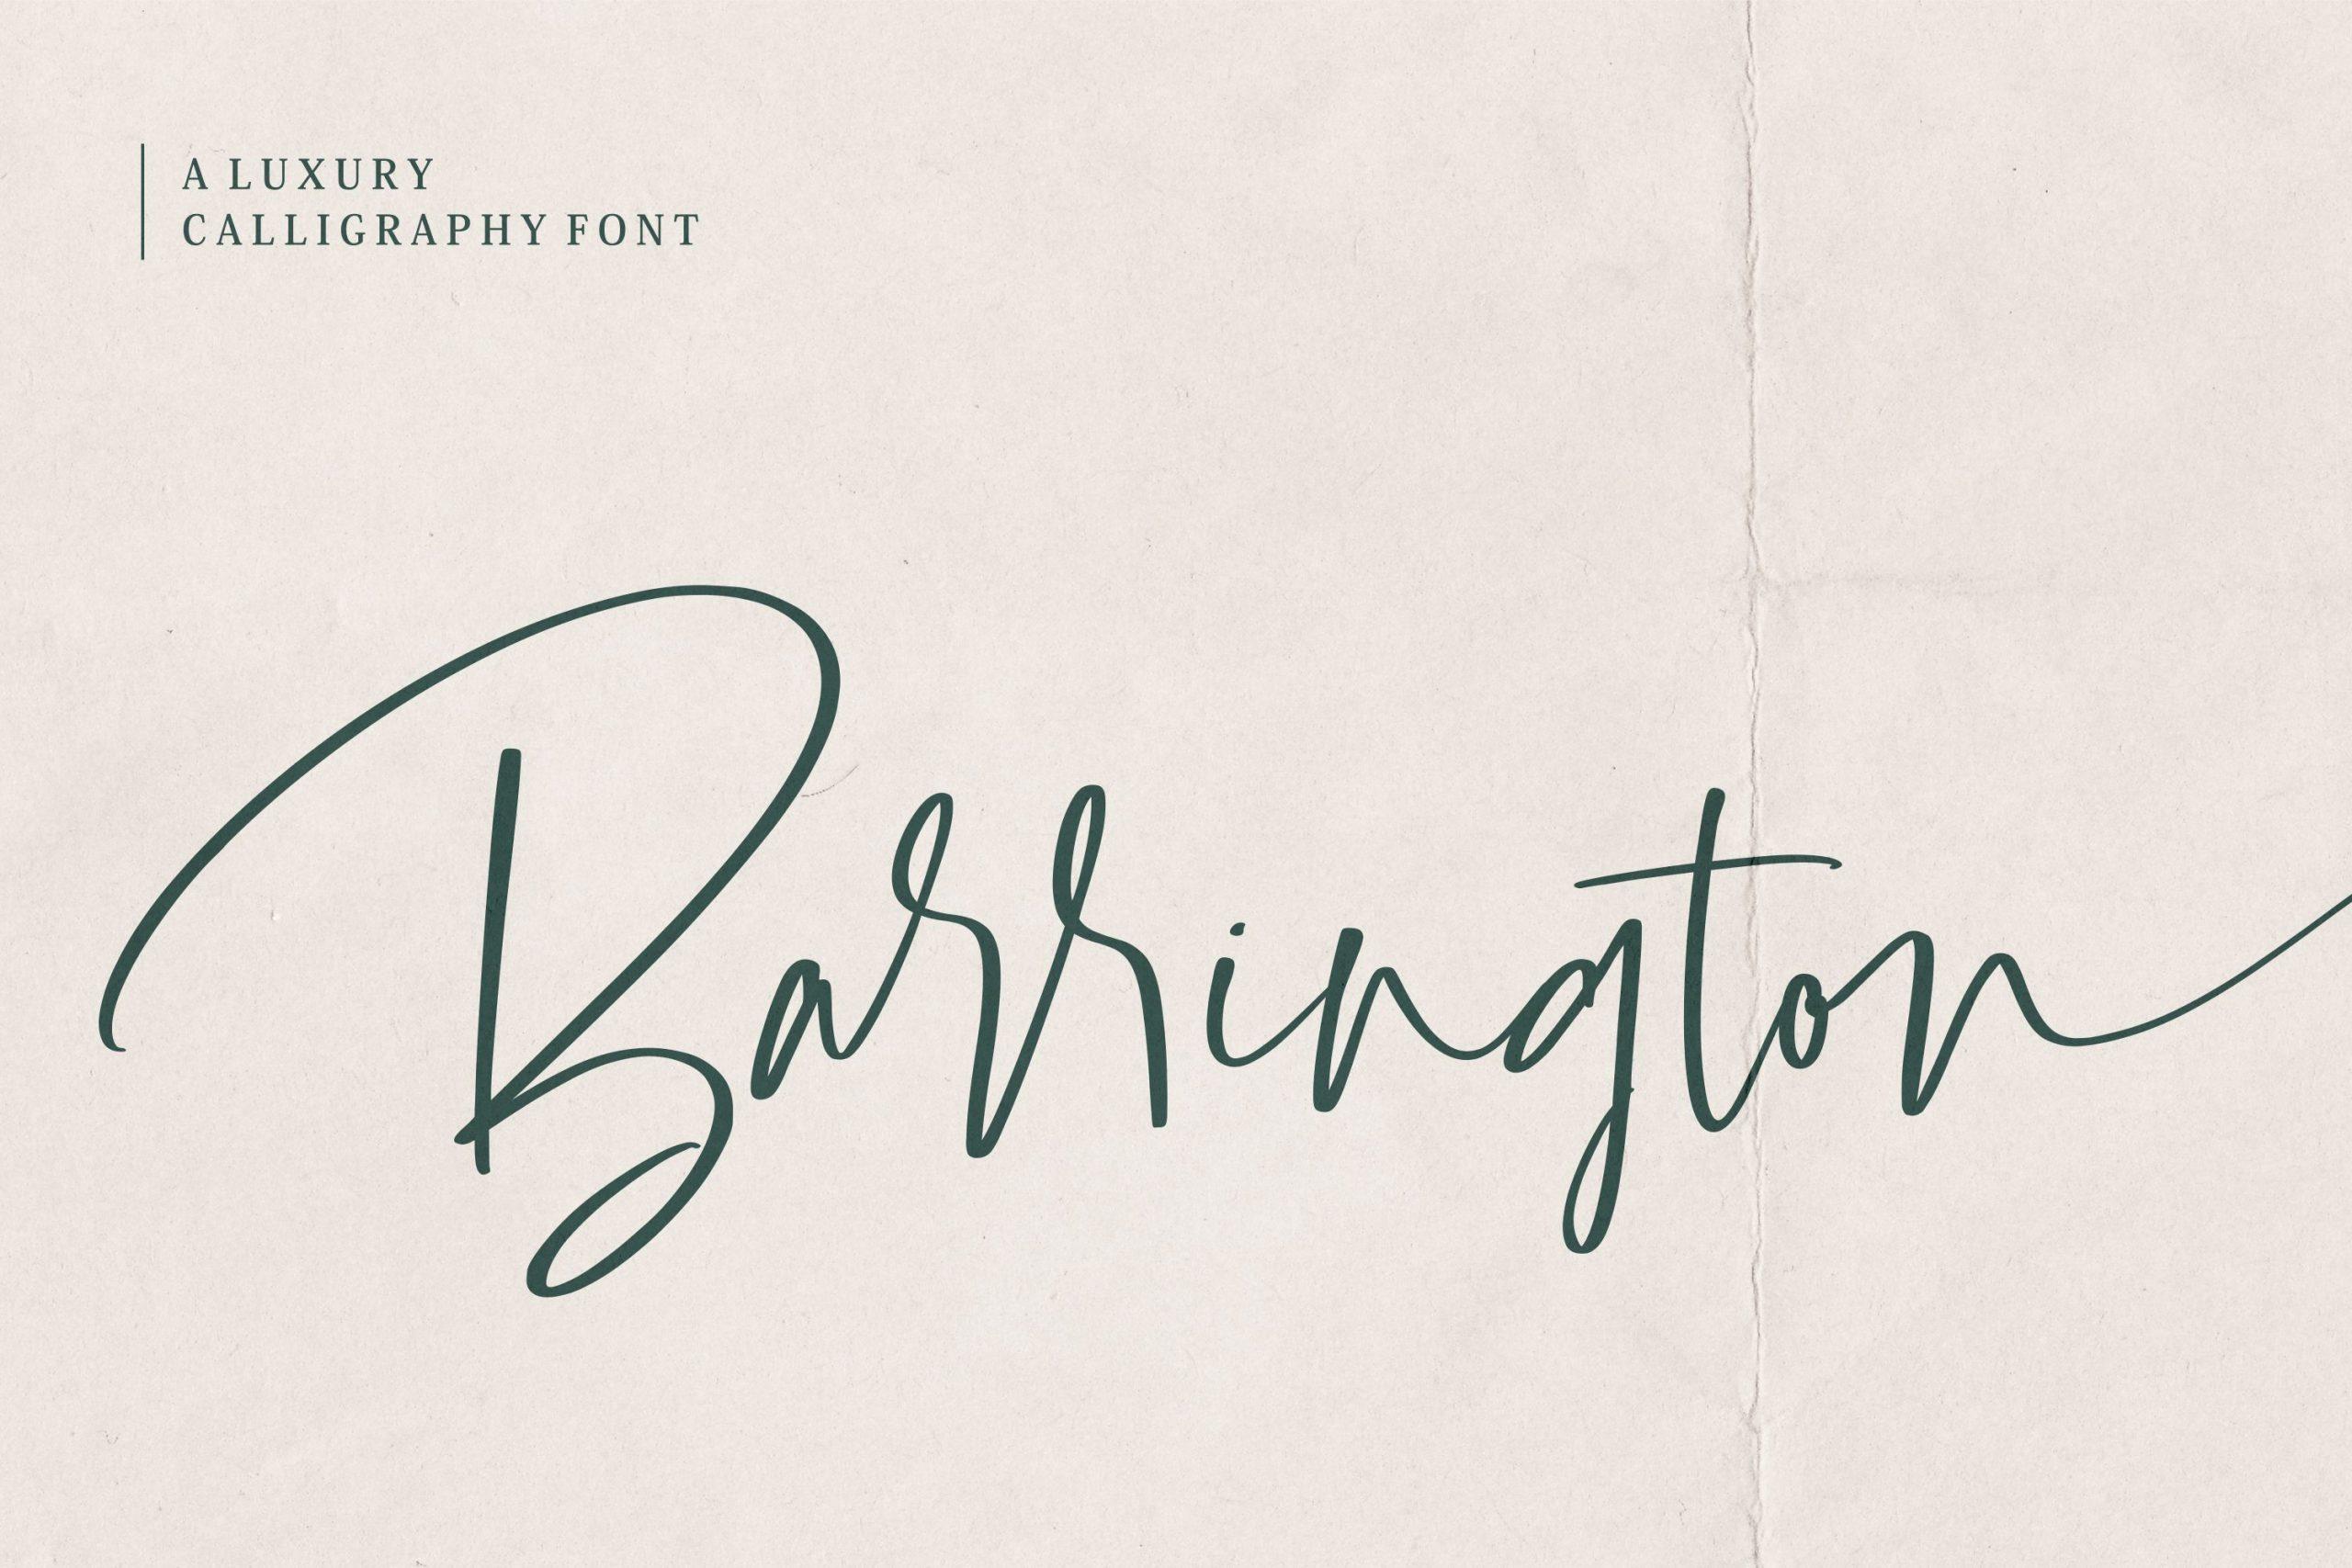 1 - Bhranta Ali-barrington